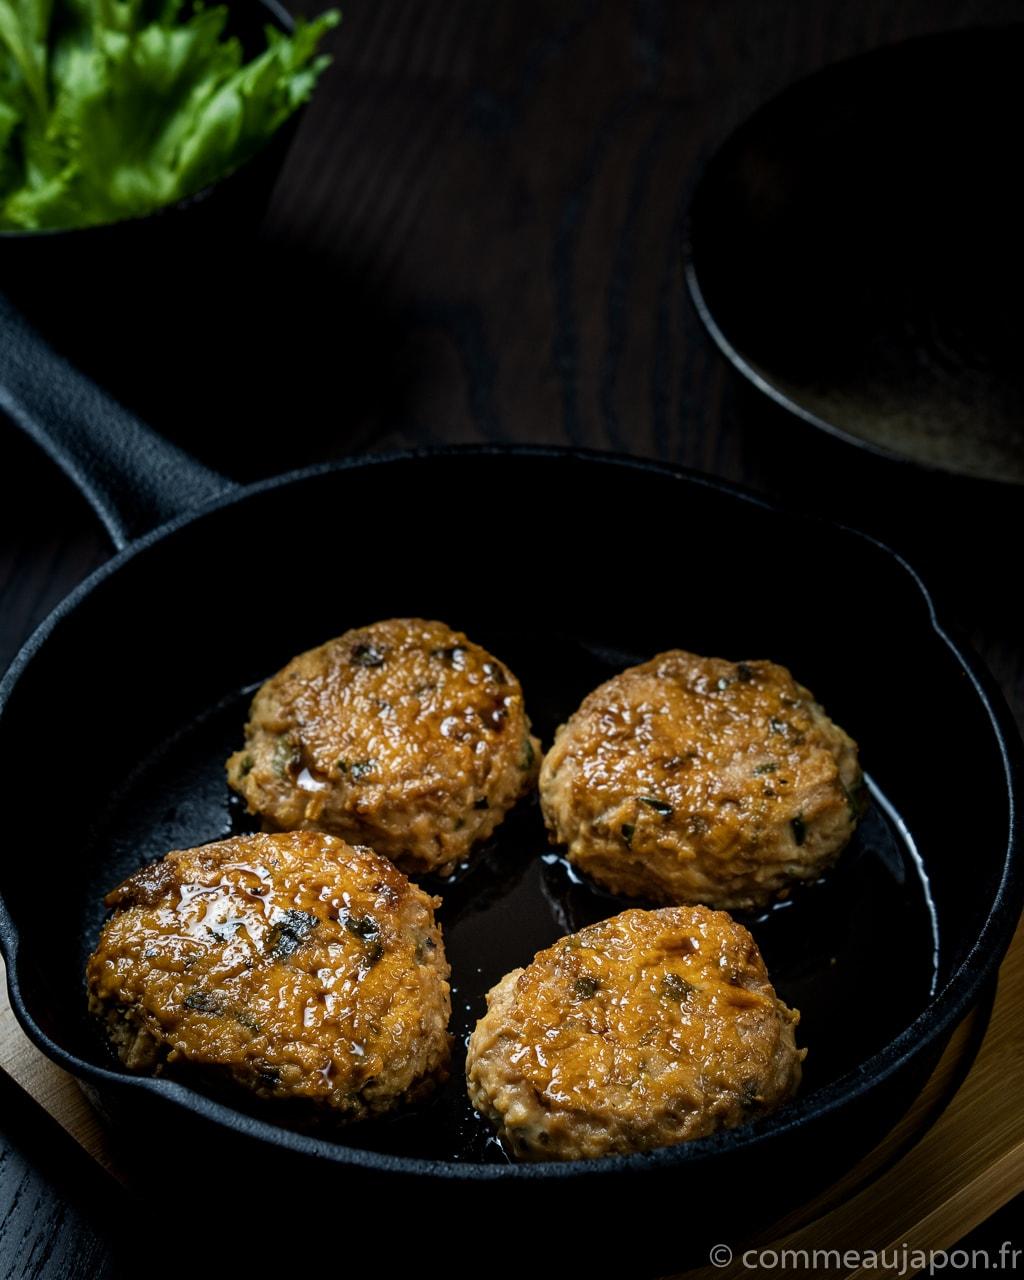 enoki burger profil Burger de poulet et enoki